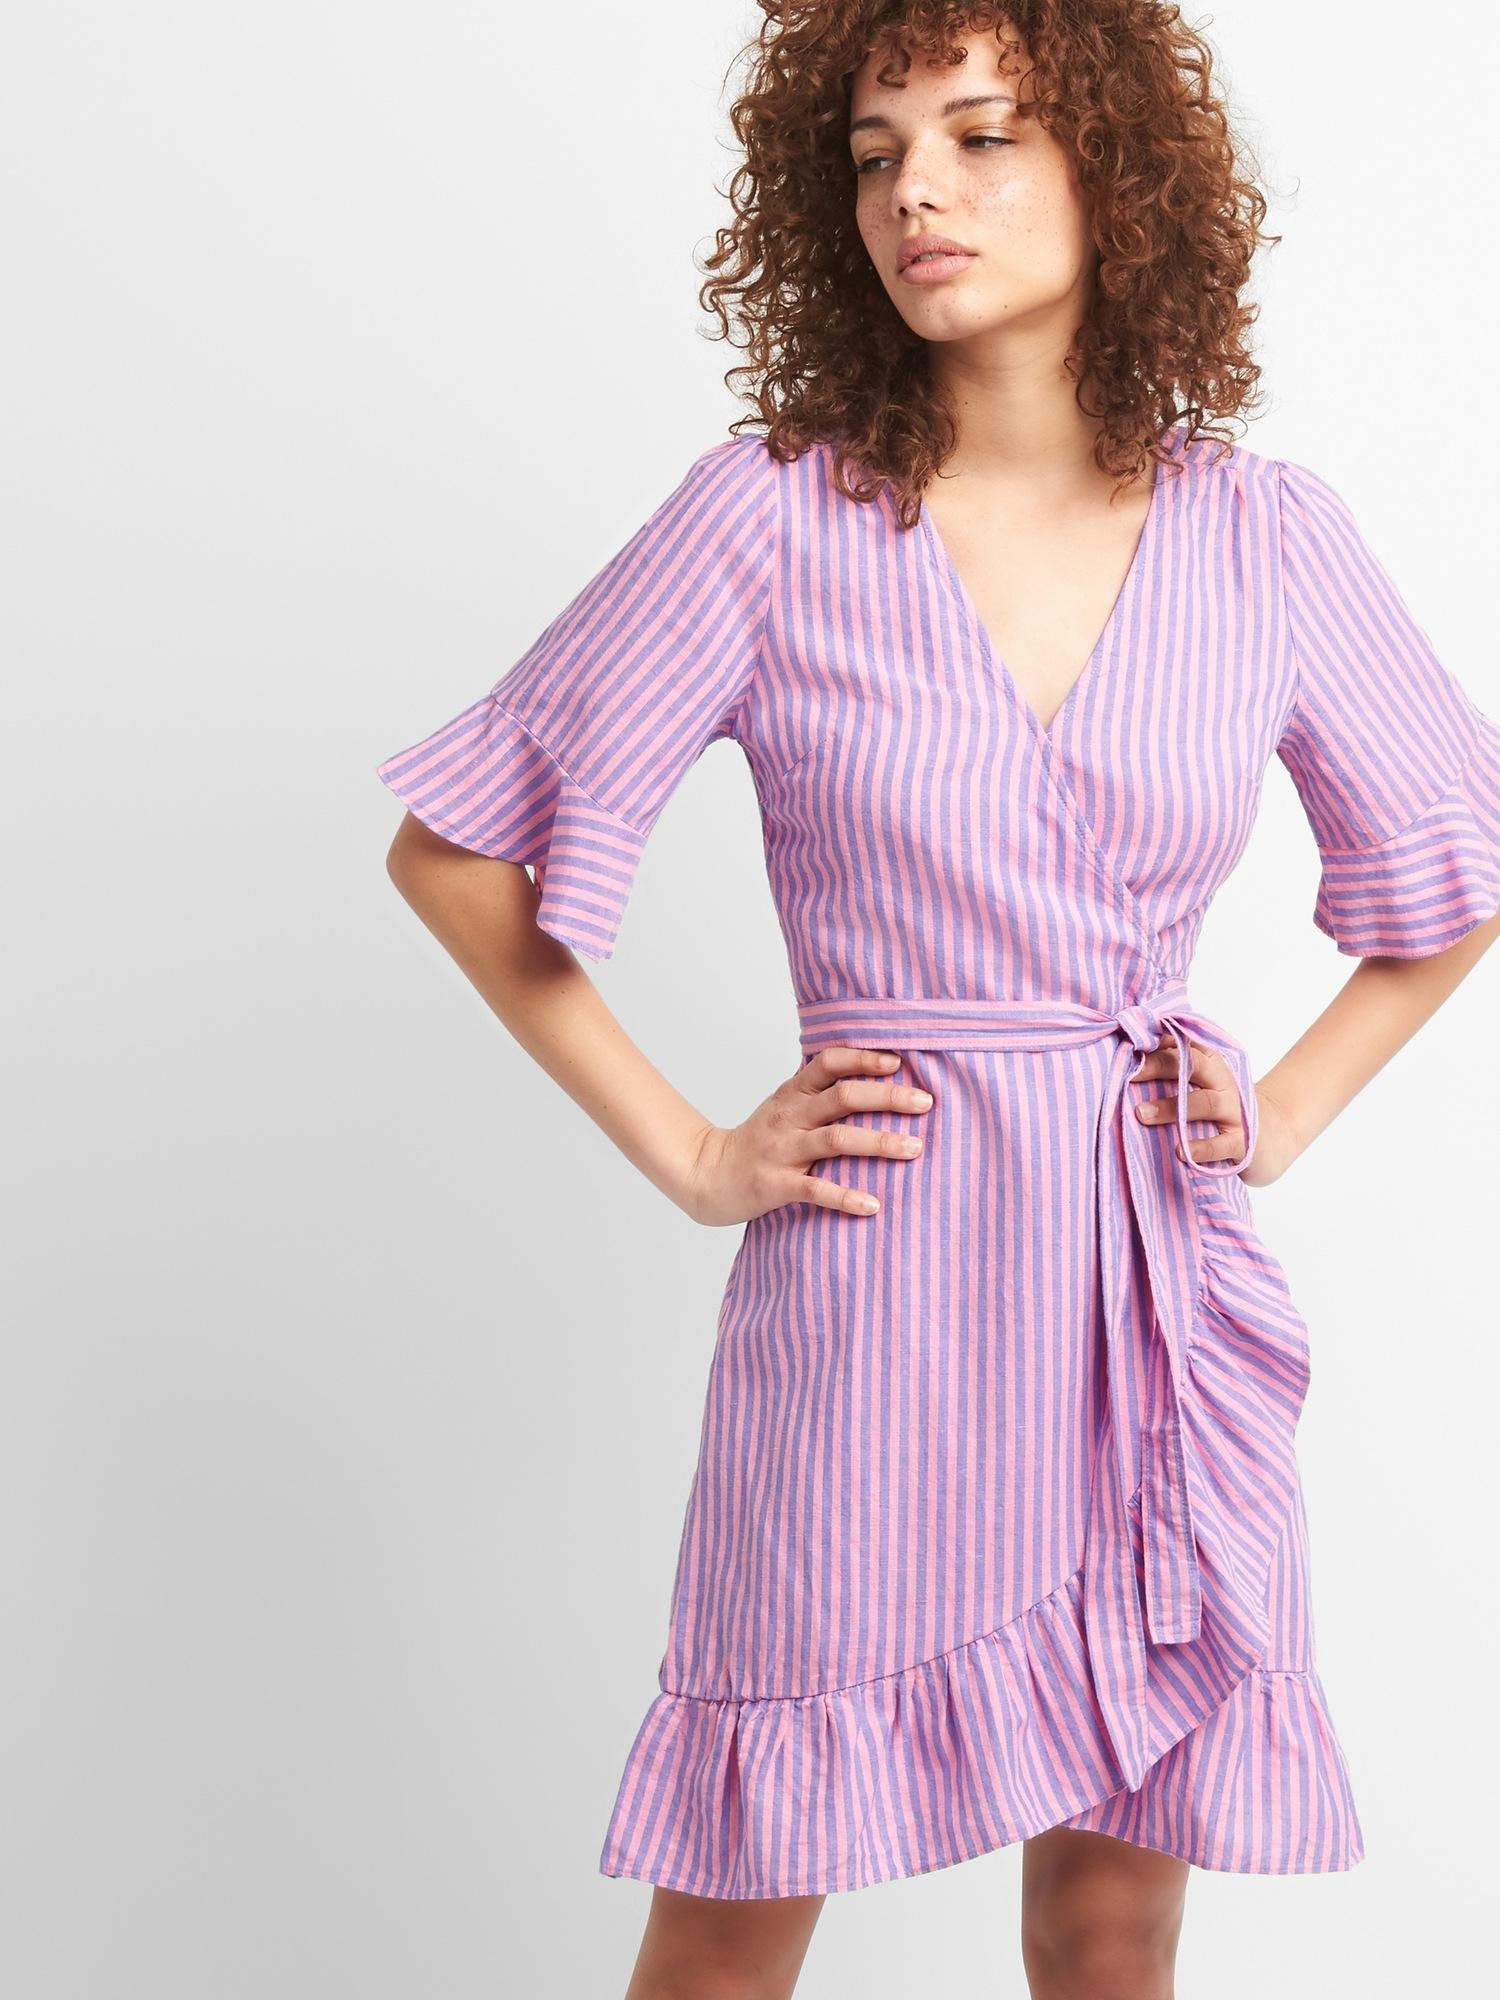 Ruffle Wrap Dress in Linen Cotton